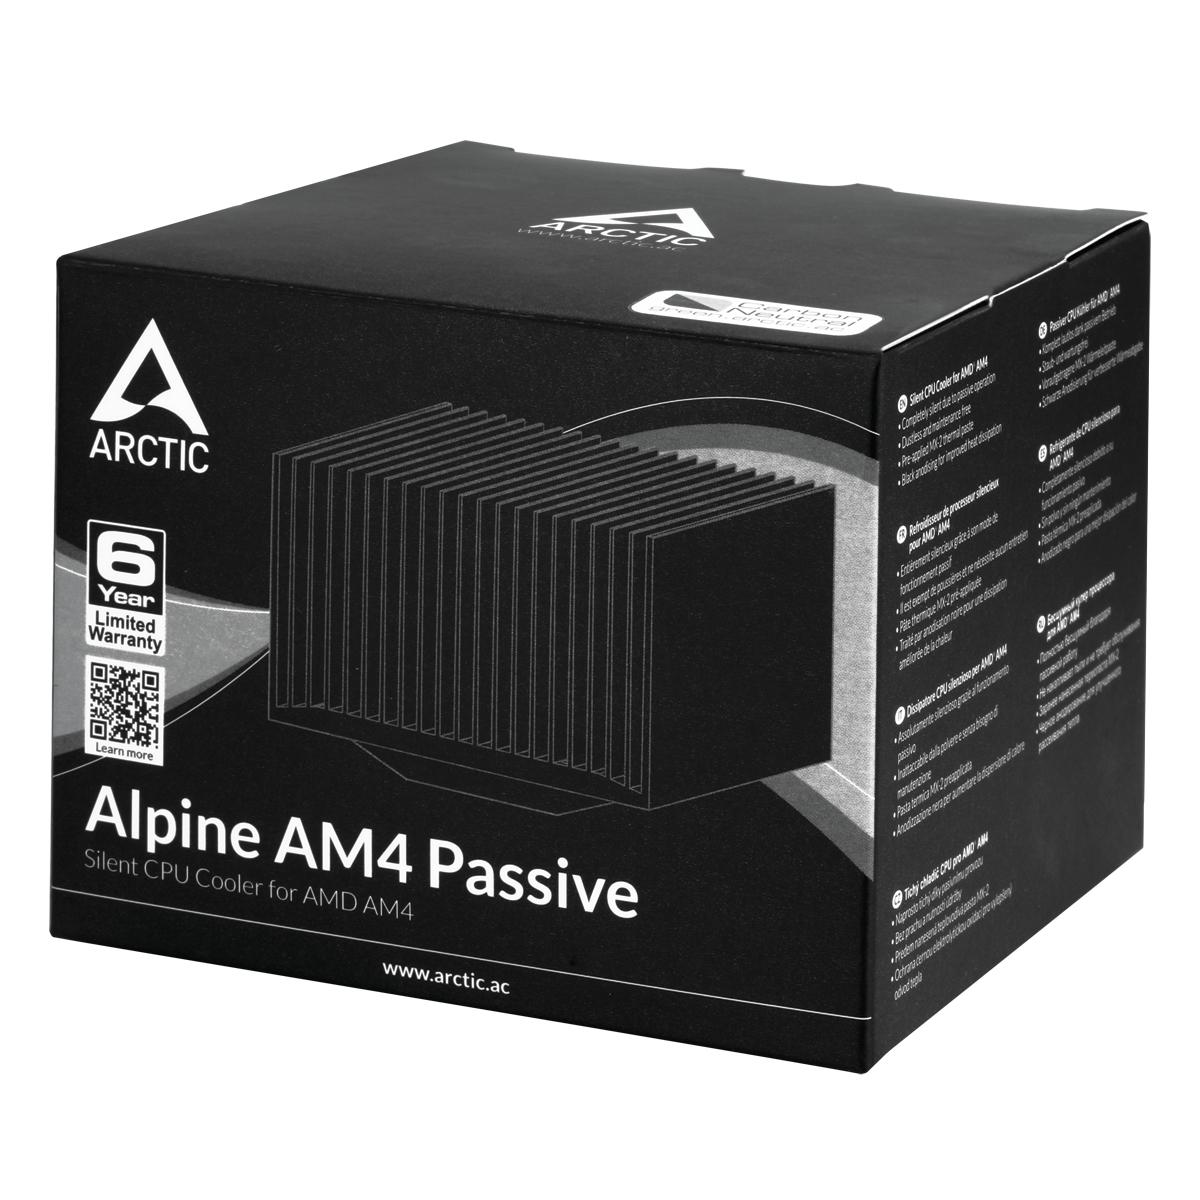 Alpine AM4 Passive